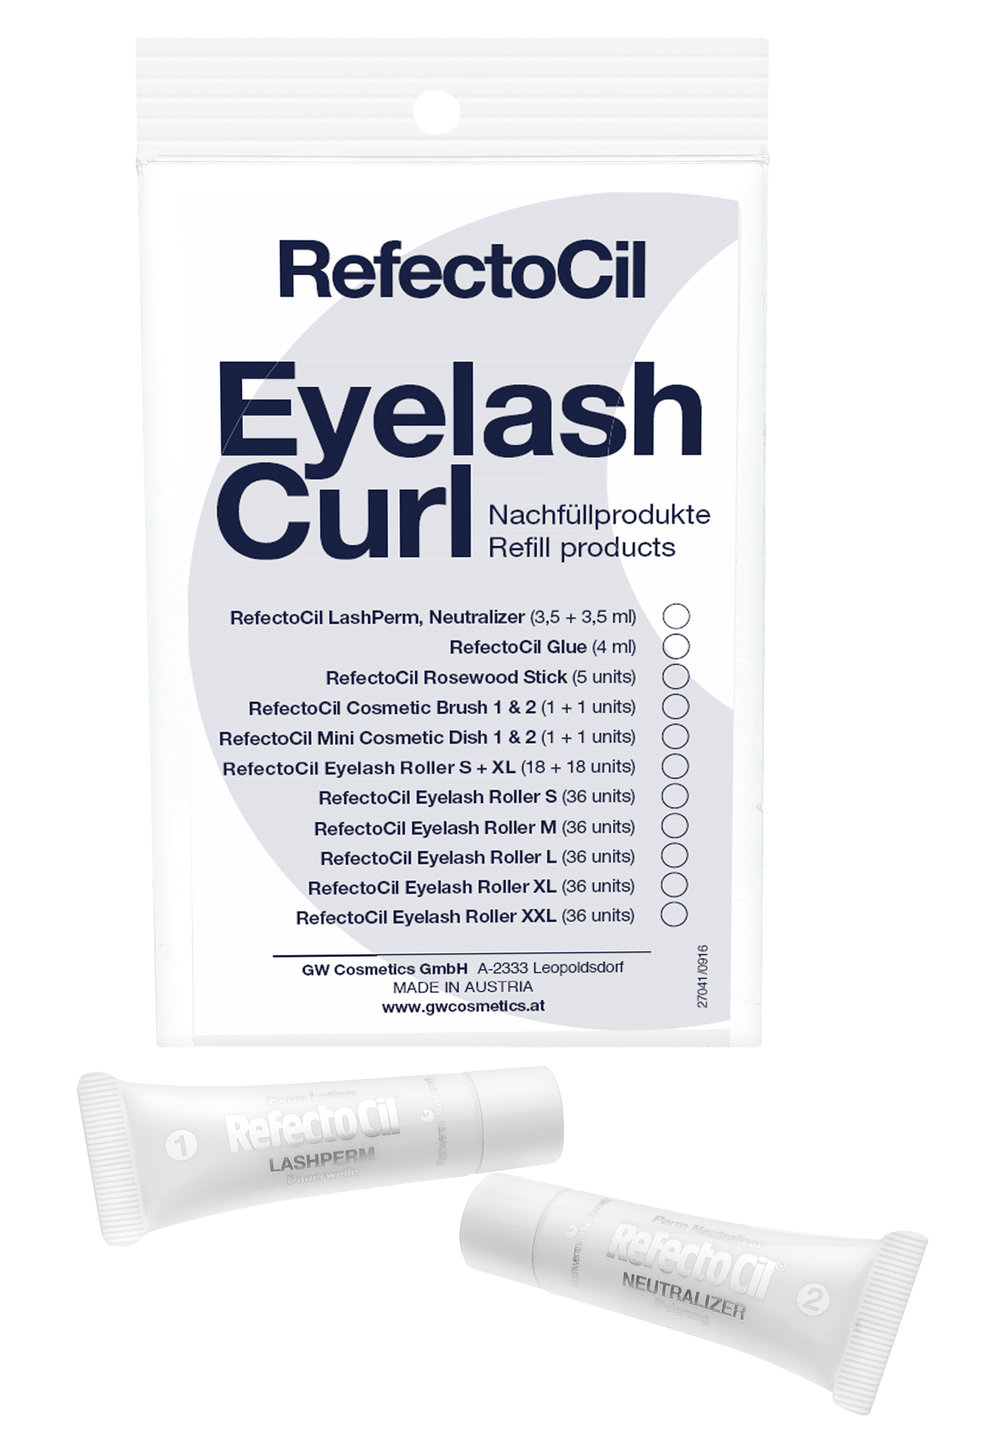 Eyelash Lash & Curl Refill - Perm/Neutralizer